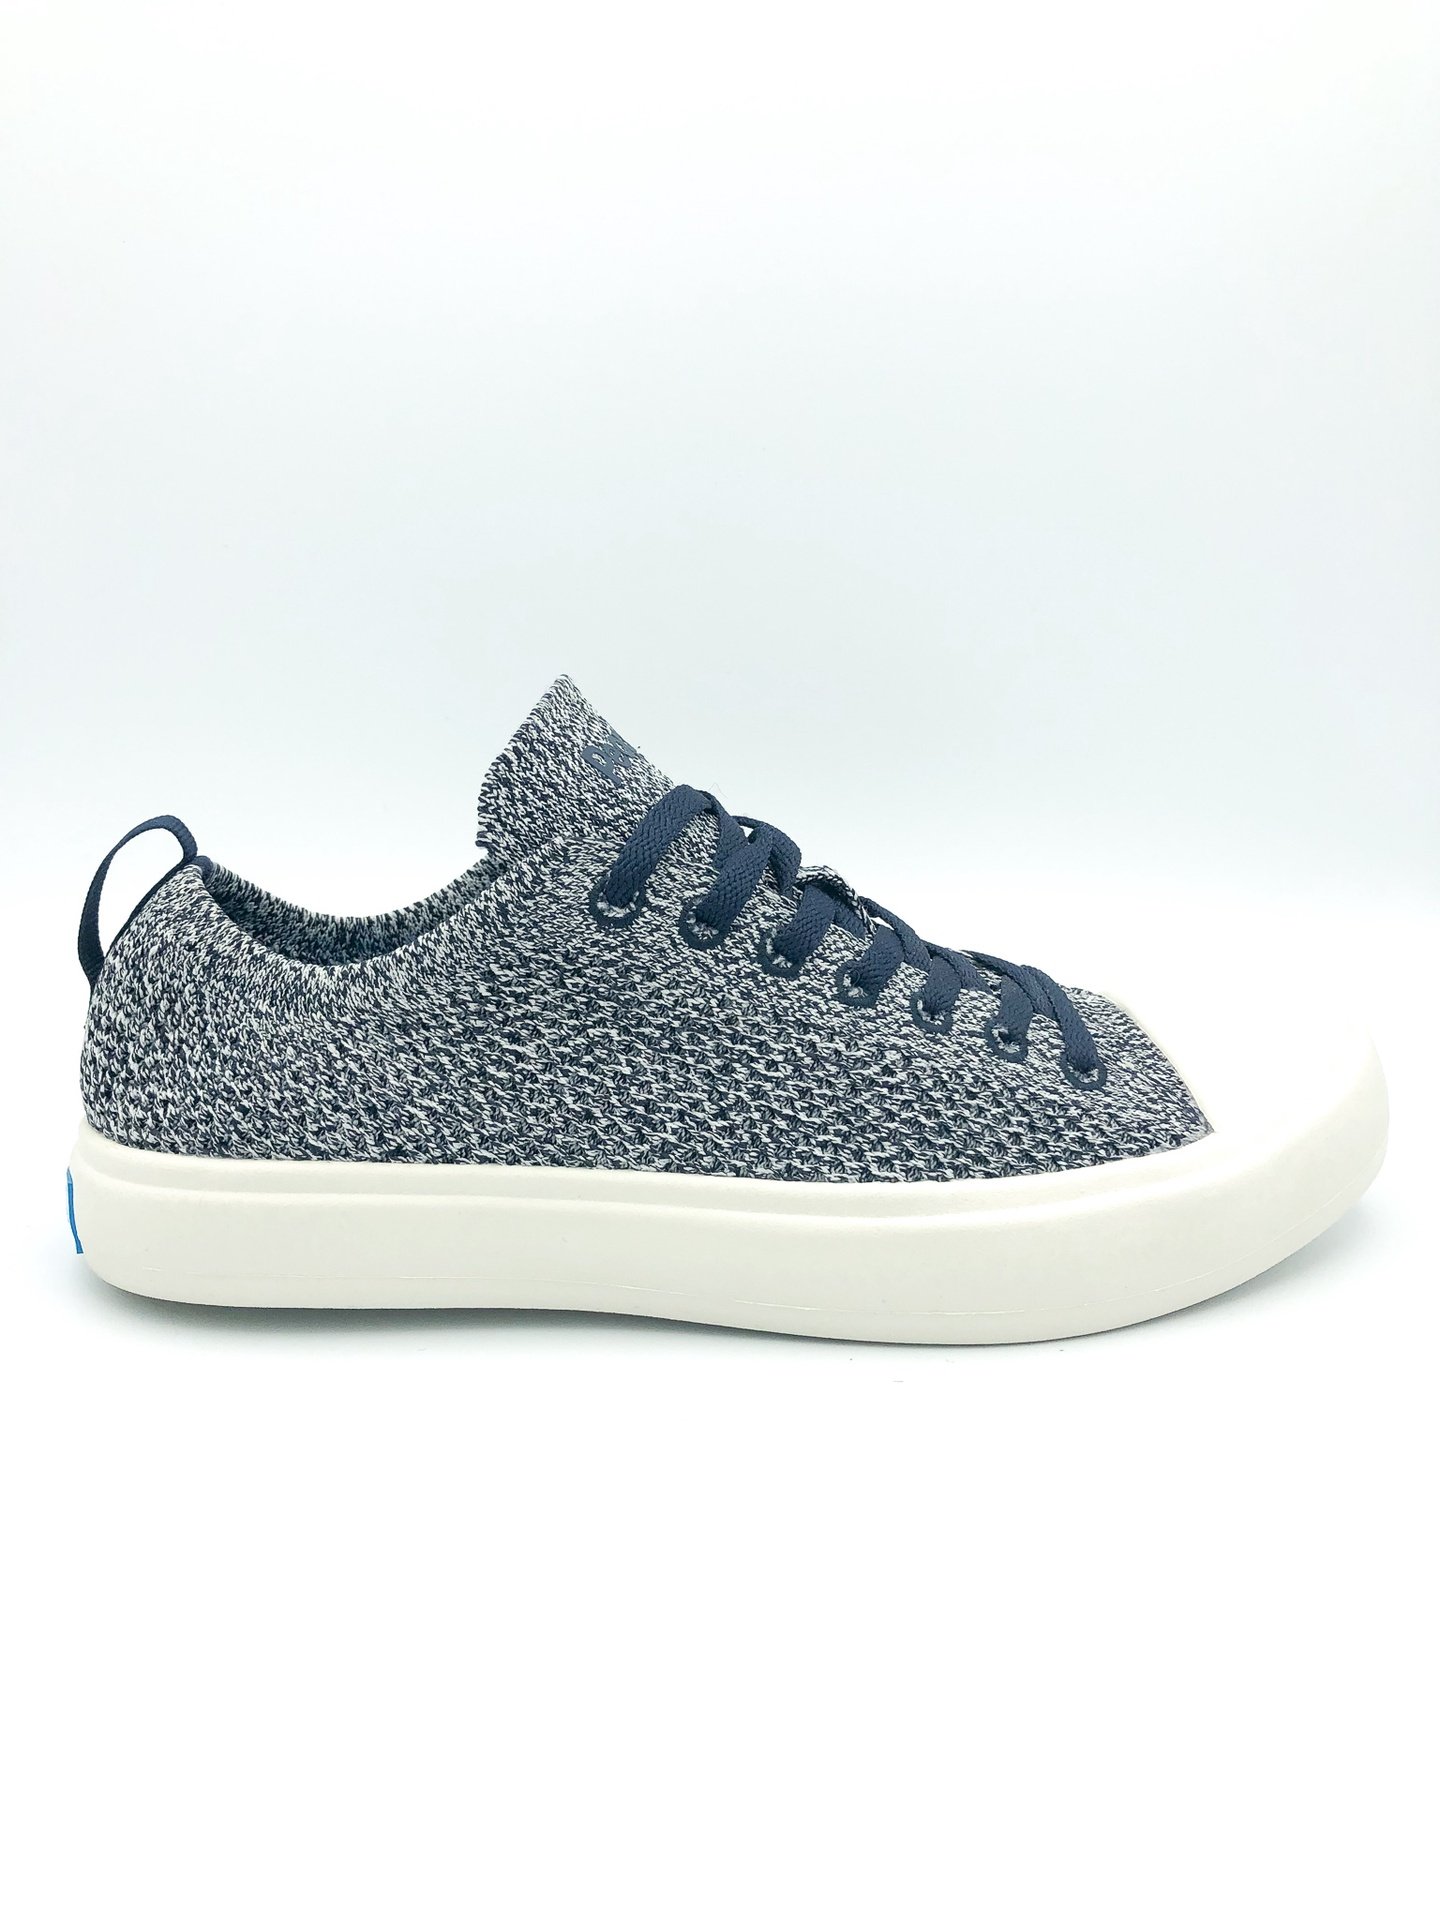 PEOPLE FOOTWEAR - THE PHILLIPS KNIT IN PADDINGTON BLUE/YETI WHITE